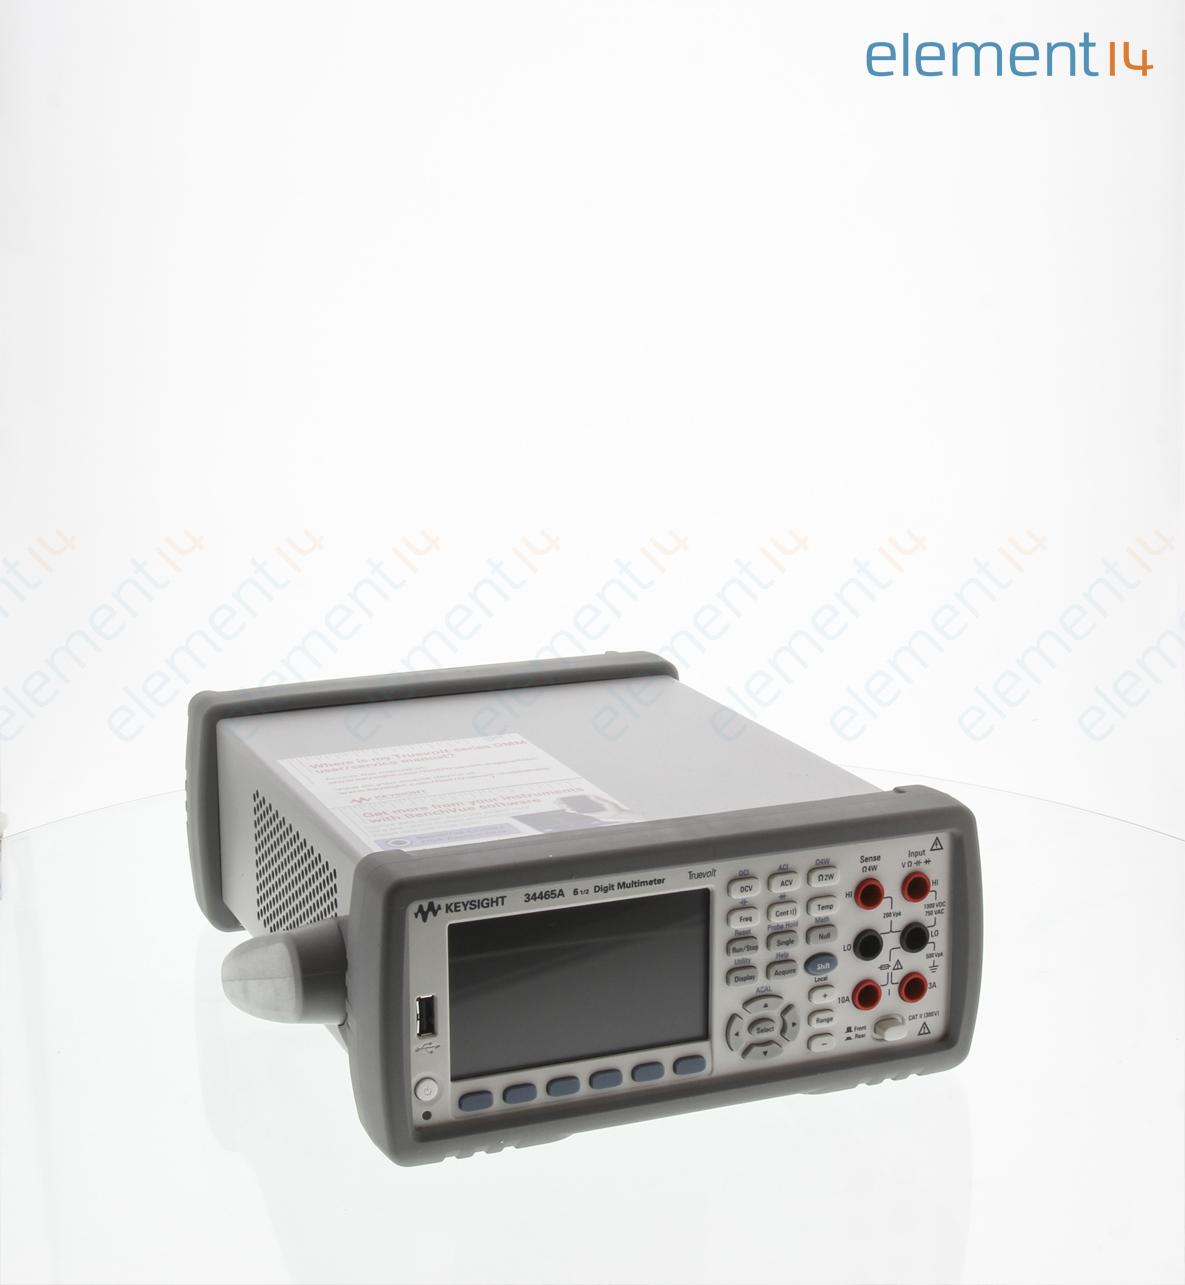 34465a Keysight Technologies Bench Digital Multimeter Truevolt Quot Stereo Phone Plug Further Circuit Diagram Richmedia 338kb En